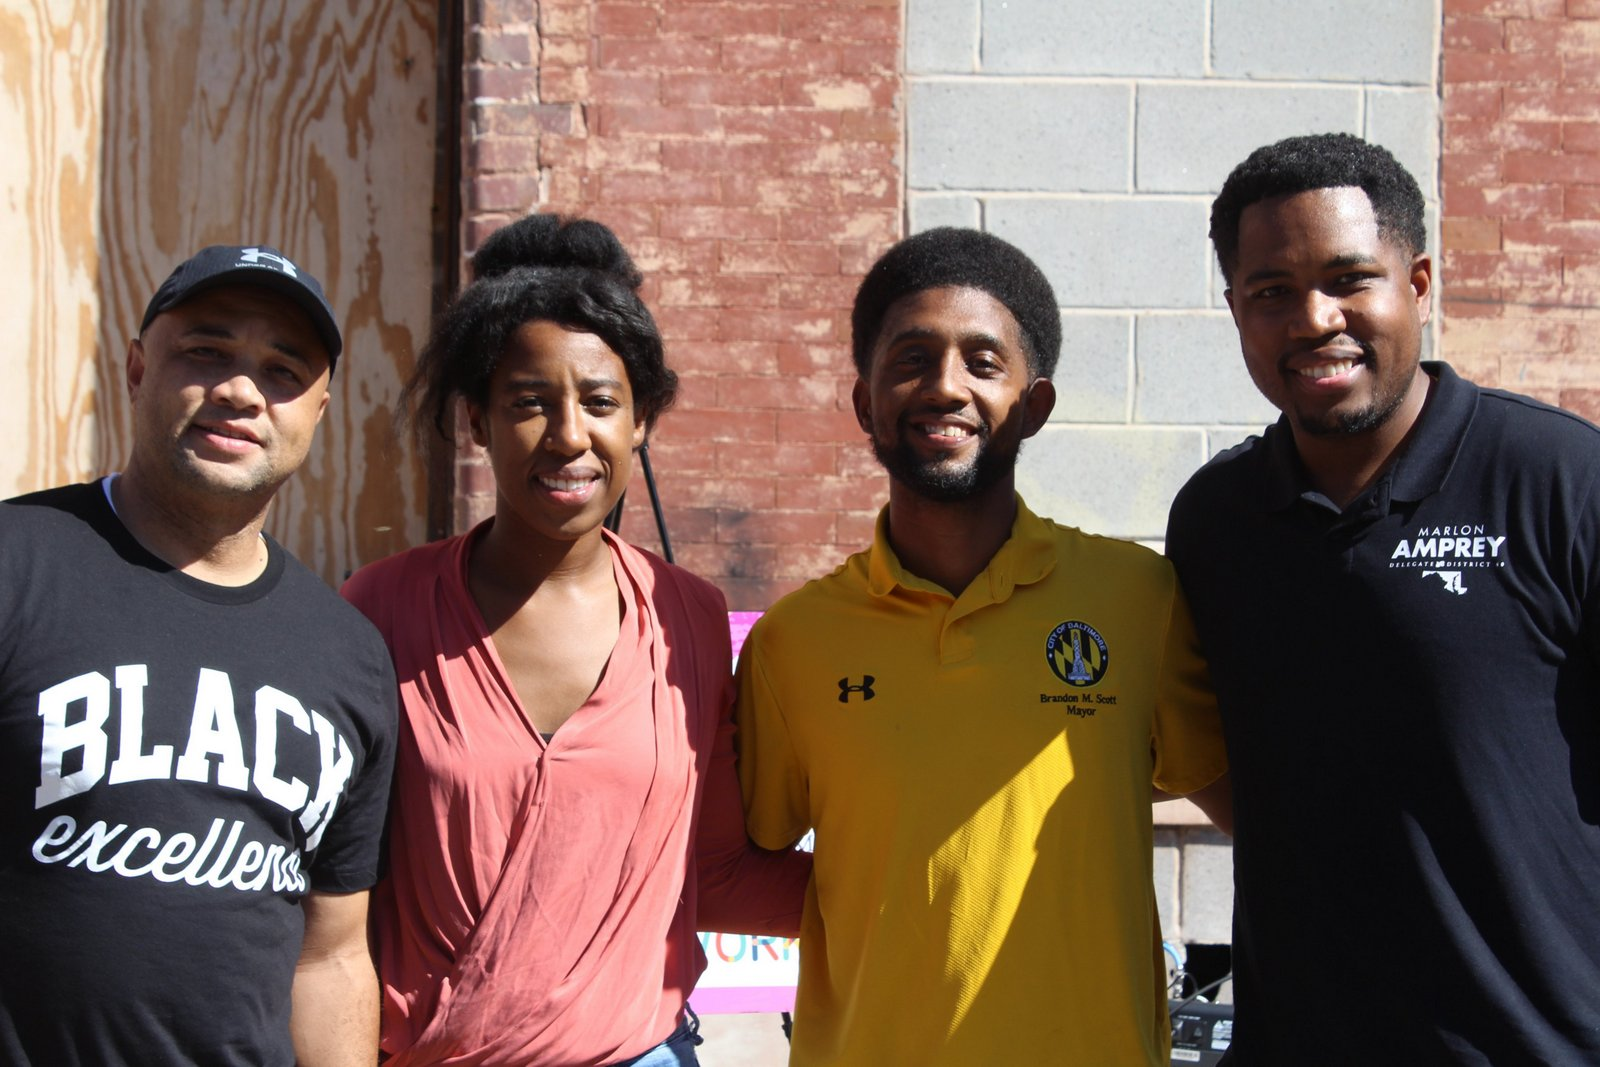 From left, Senator Antonio Hayes, Parity Homes founder Bree Jones, Mayor Brandon Scott and Delegate Marlon Amprey, all maskless, at an event on Saturday. (@MayorBMScott)